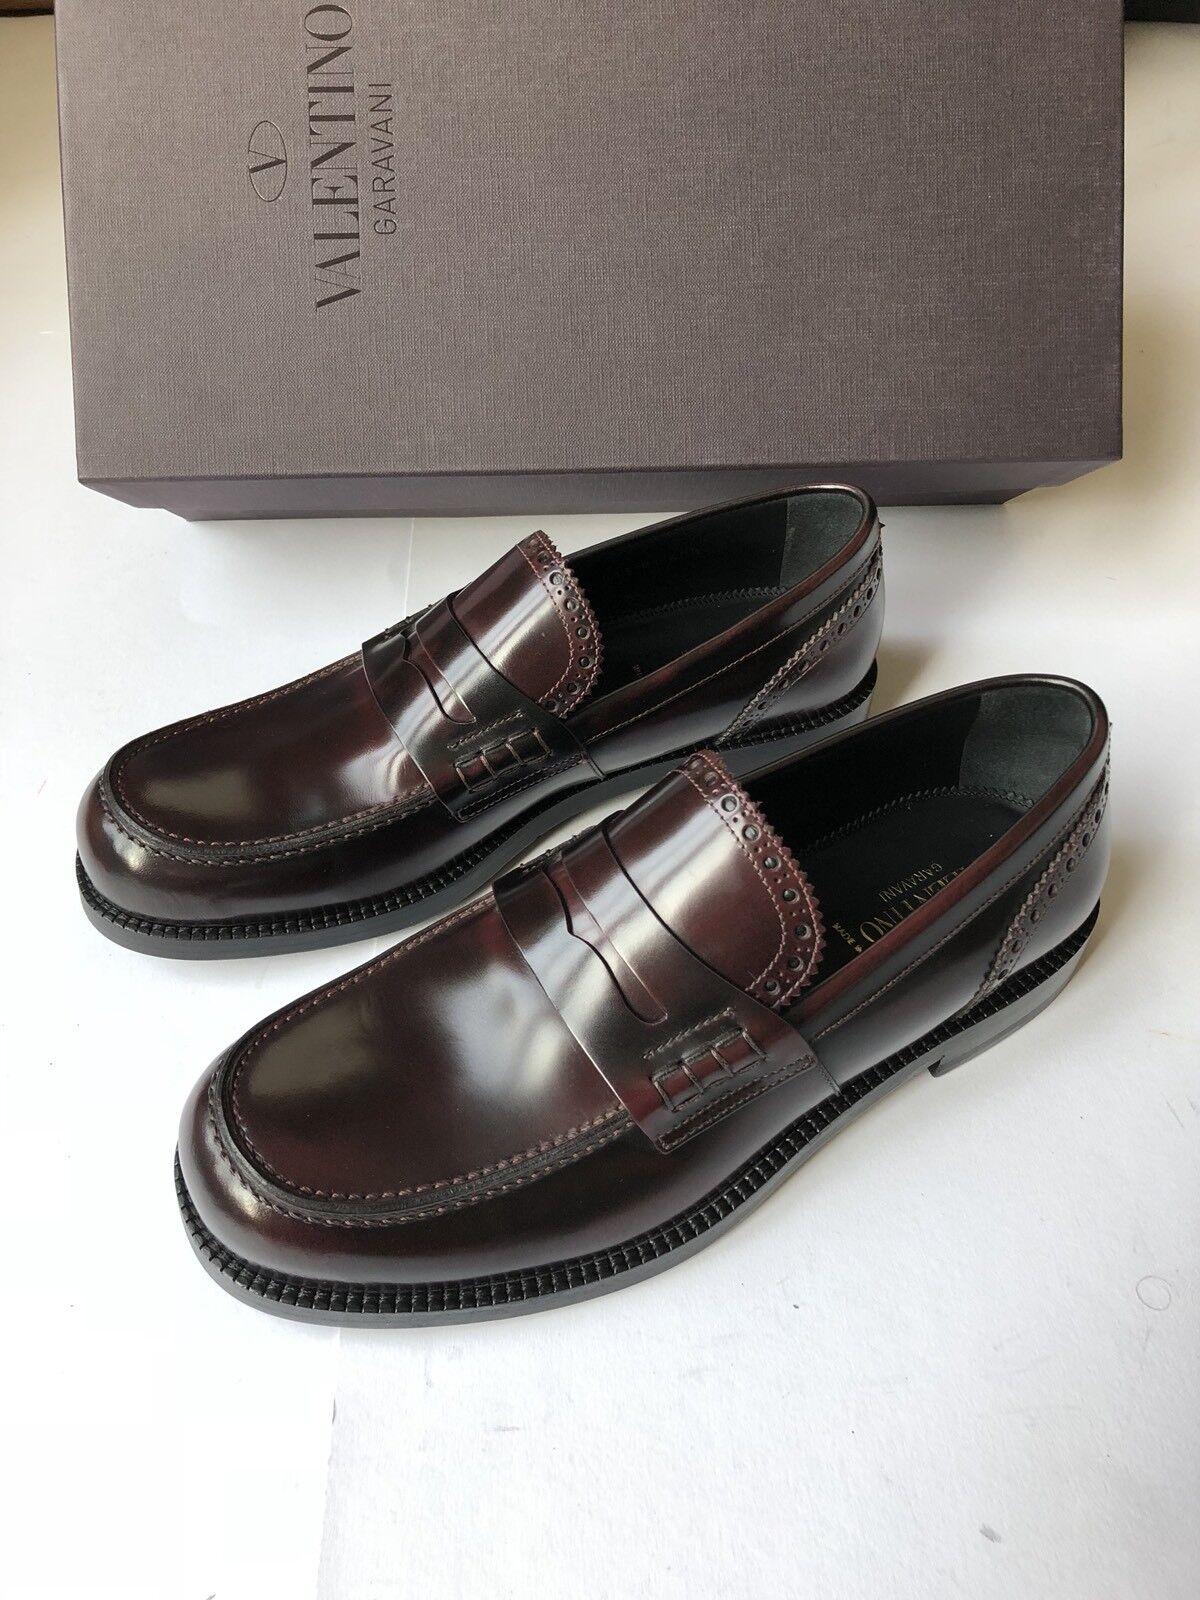 VALENTINO Garavani Leder Loafer/Schuhe rubin EU 40,5 UK 6,5 US 7,5 NEU OVP